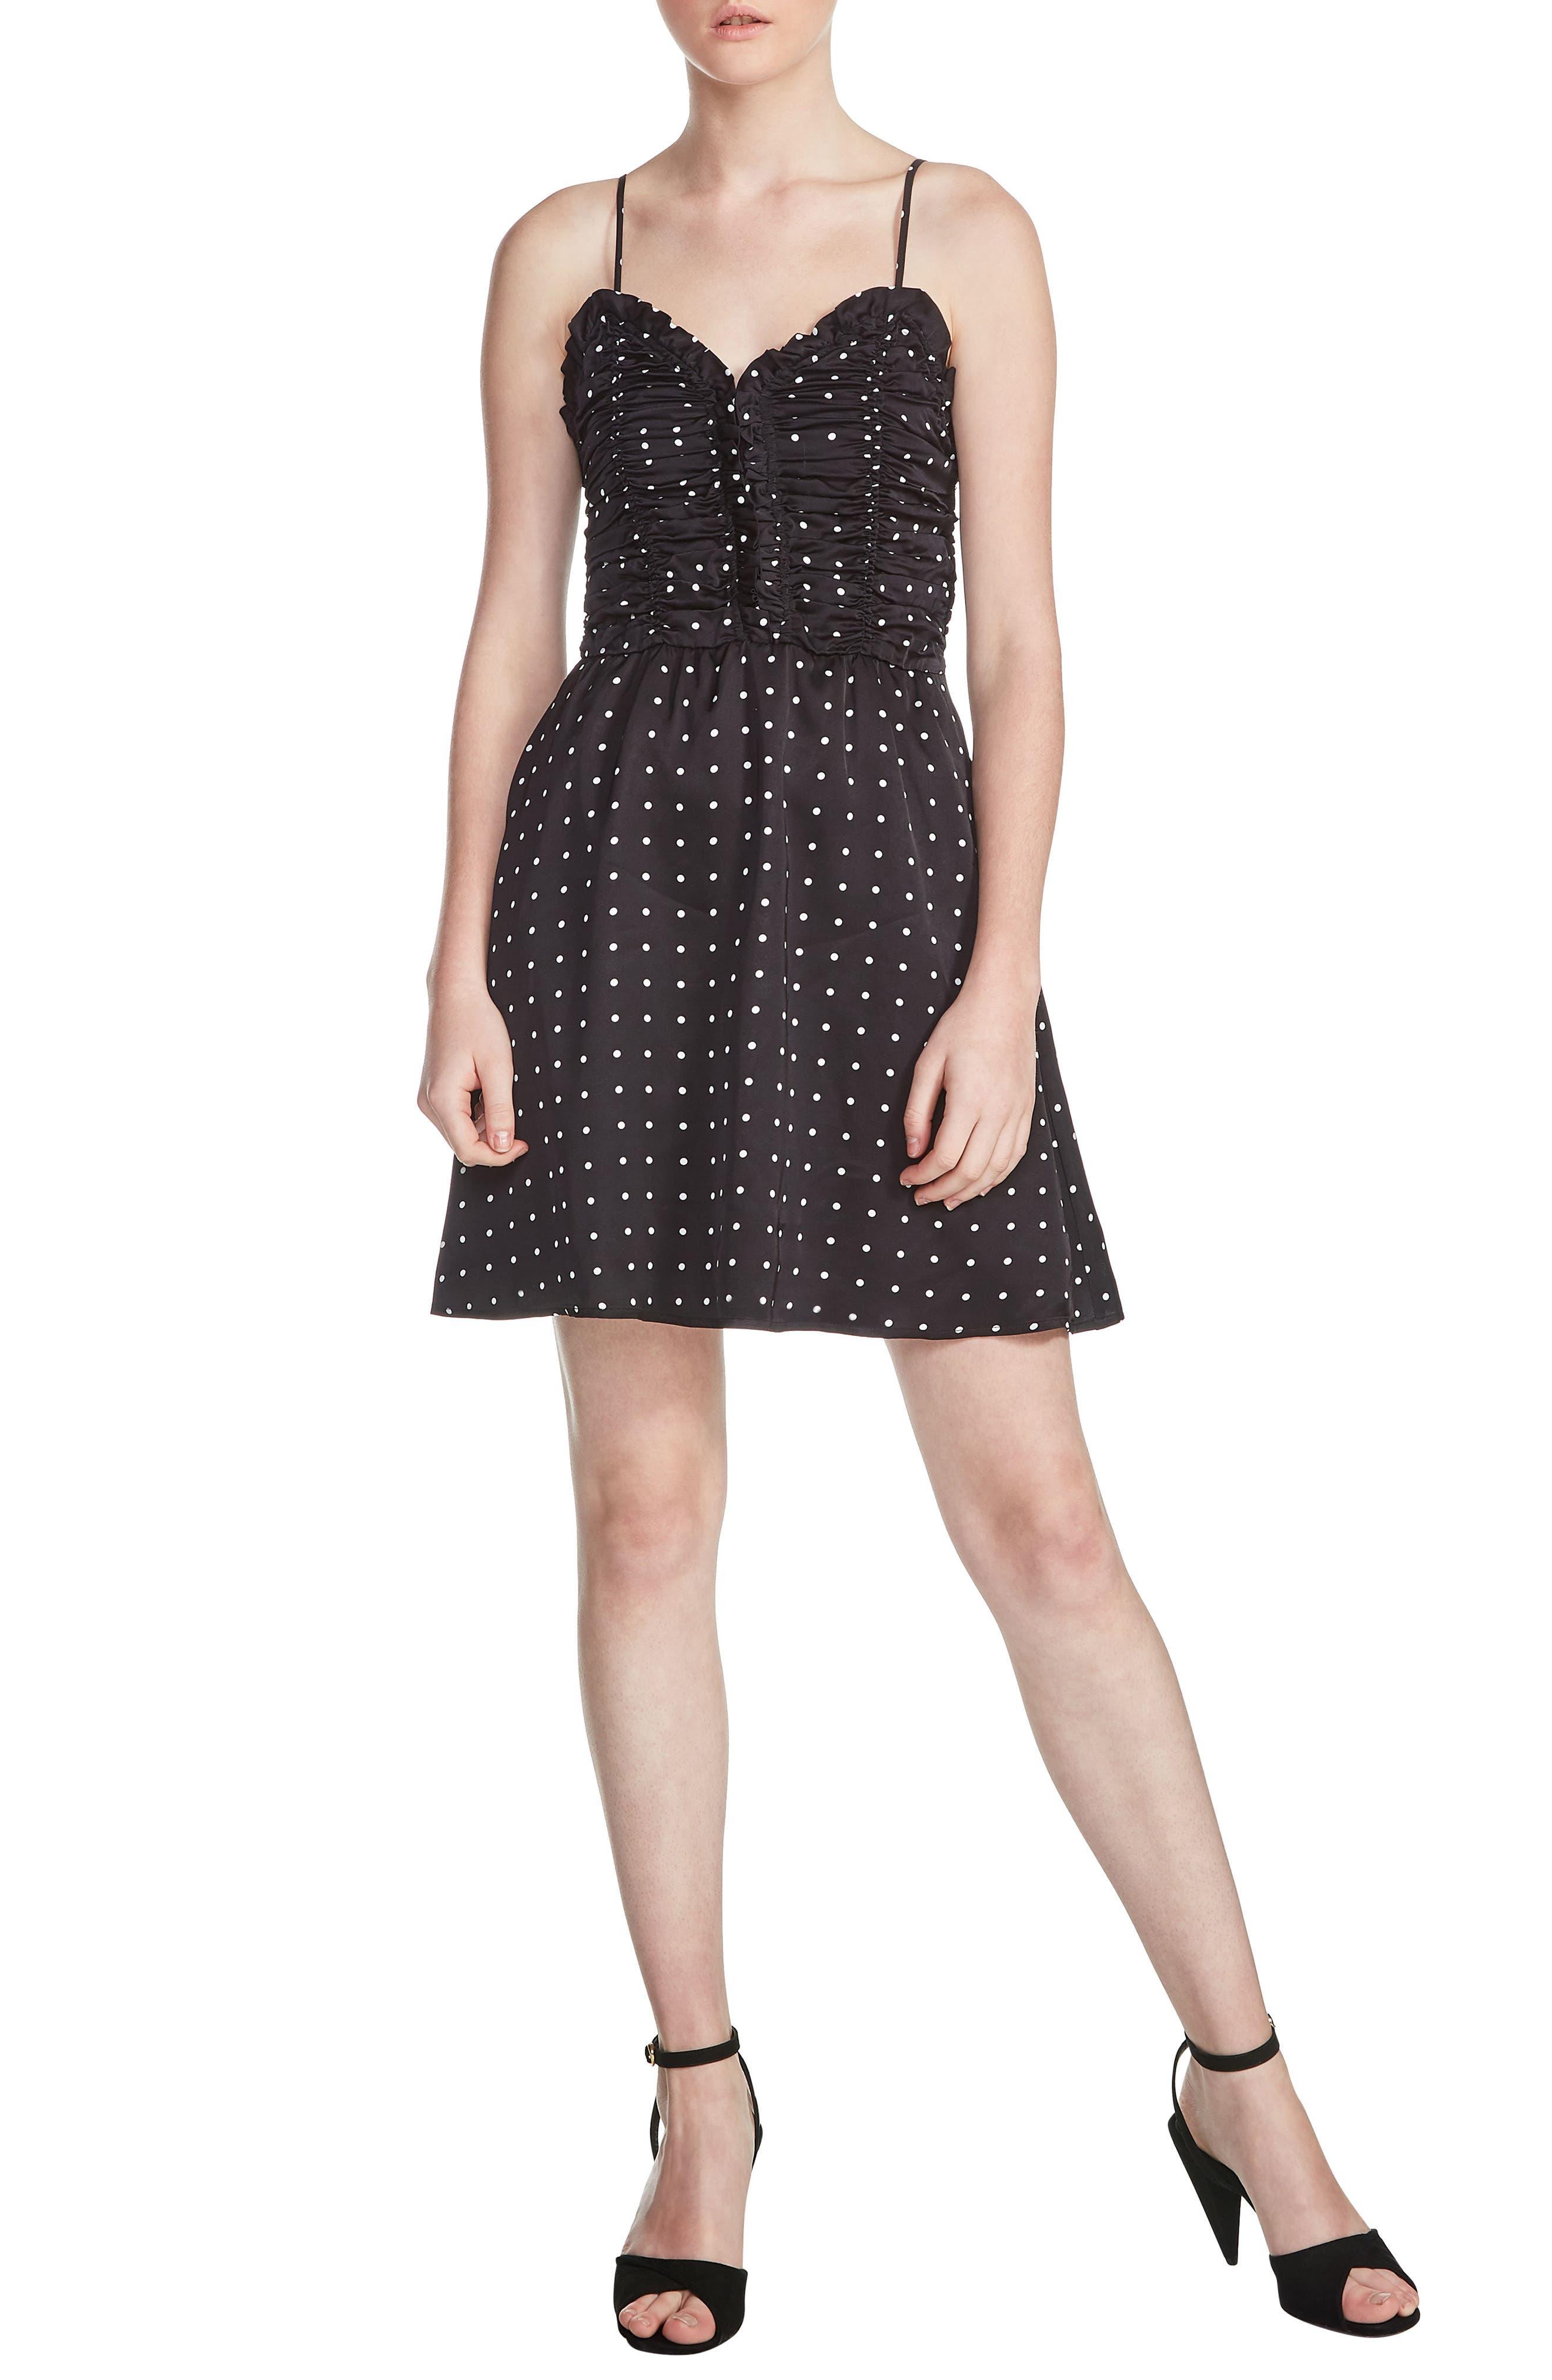 Alternate Image 1 Selected - maje Renota Polka Dot Fit & Flare Dress